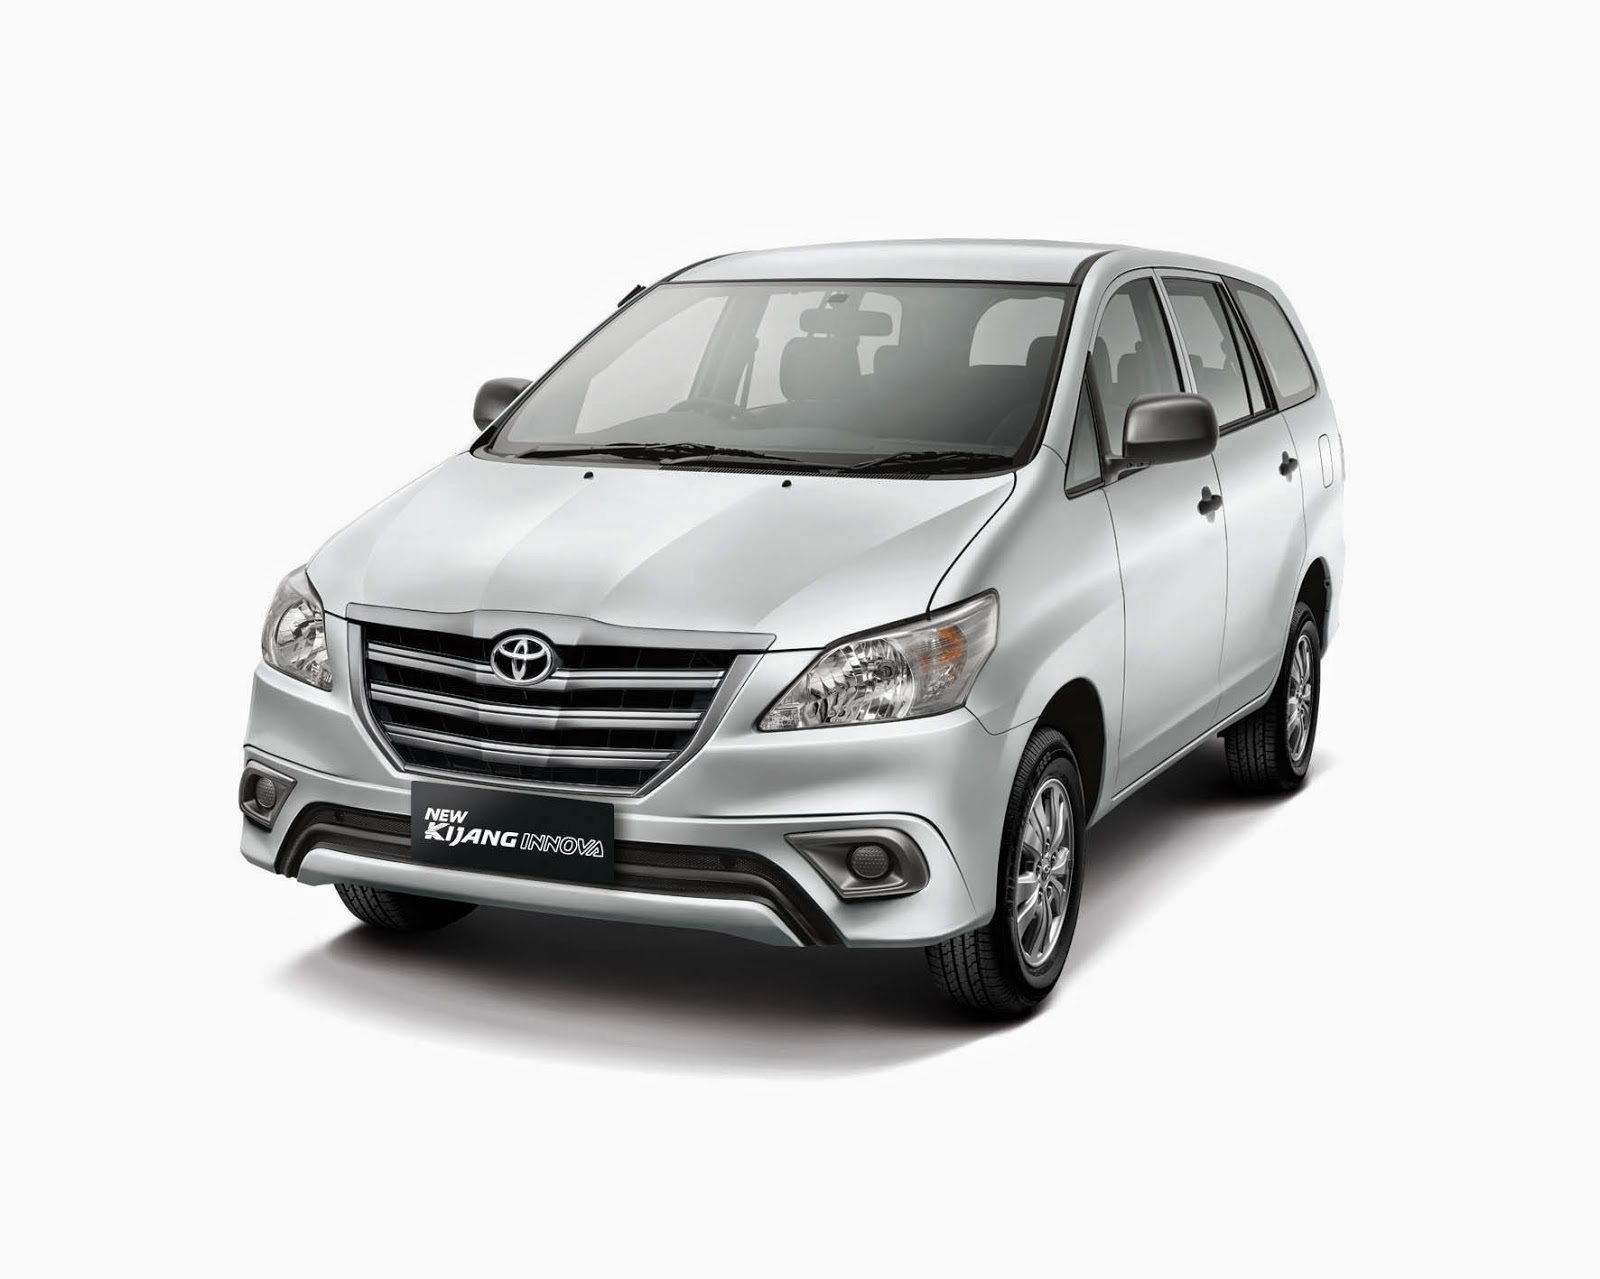 All New Kijang Innova 2.4 G At Diesel Kelemahan Yaris Trd Sportivo Toyota Lampung Auto 2000 Rajabasa